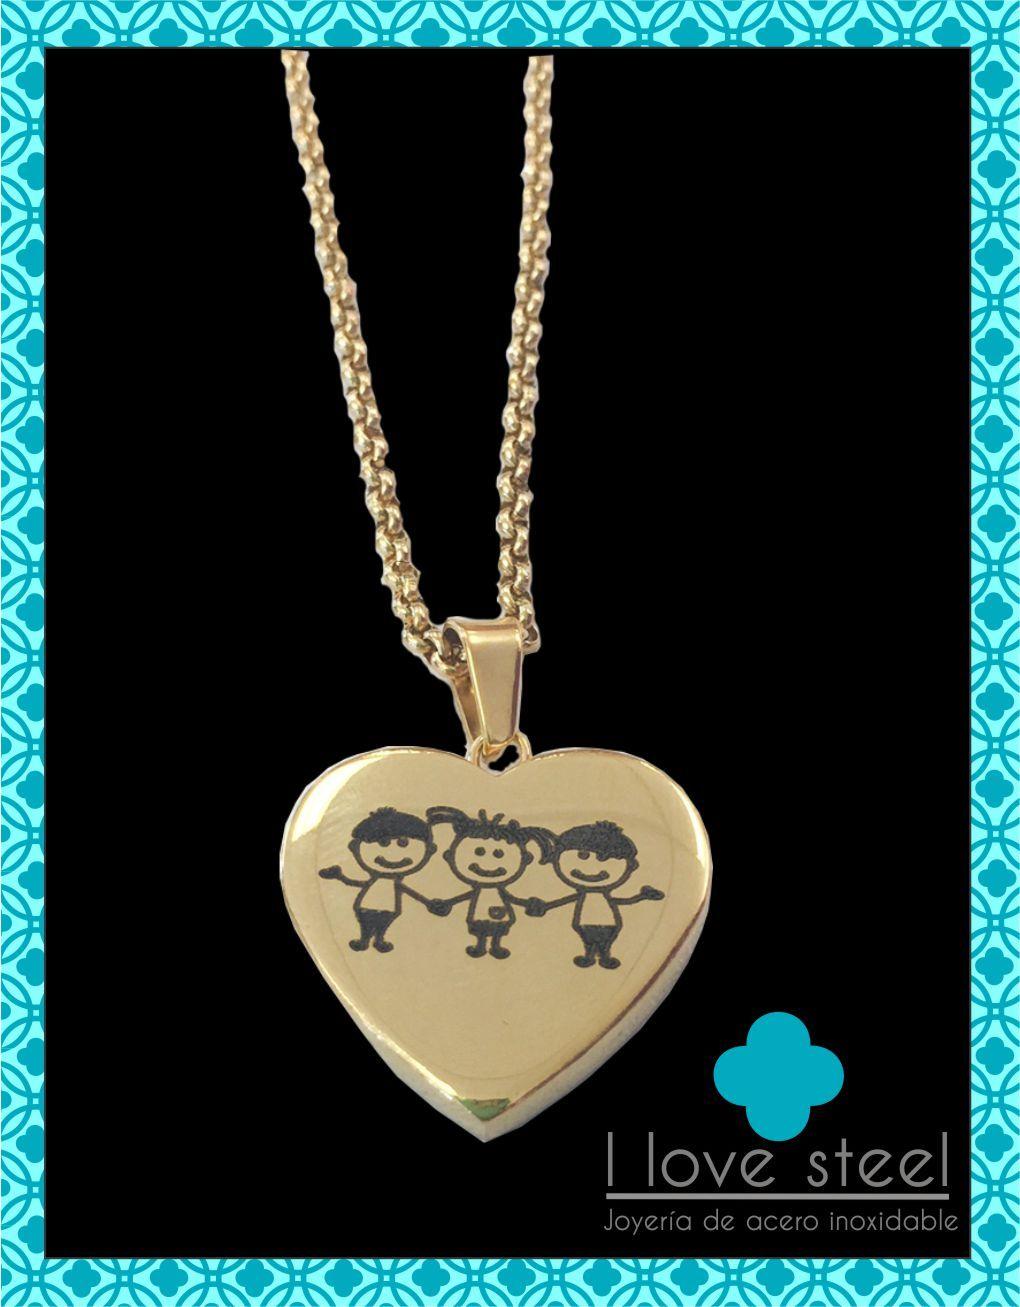 a641a3d401e9 Collar con dije corazón de acero inoxidable personalizado - I Love Steel